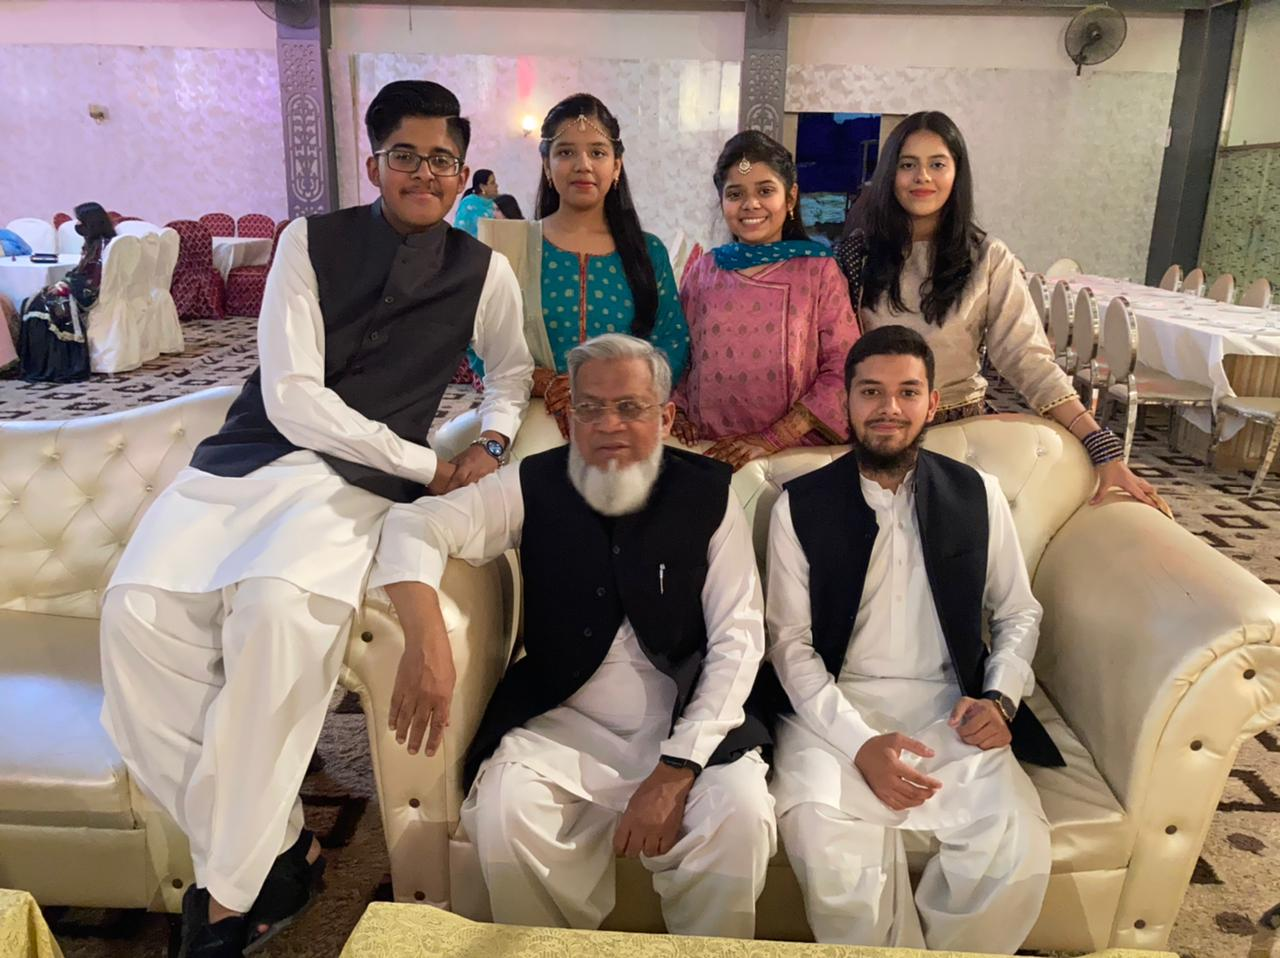 Engr. Iqbal Ahmed Khan with his grandchildren, Habib, Zoya, Zara, Mariam and Obaid